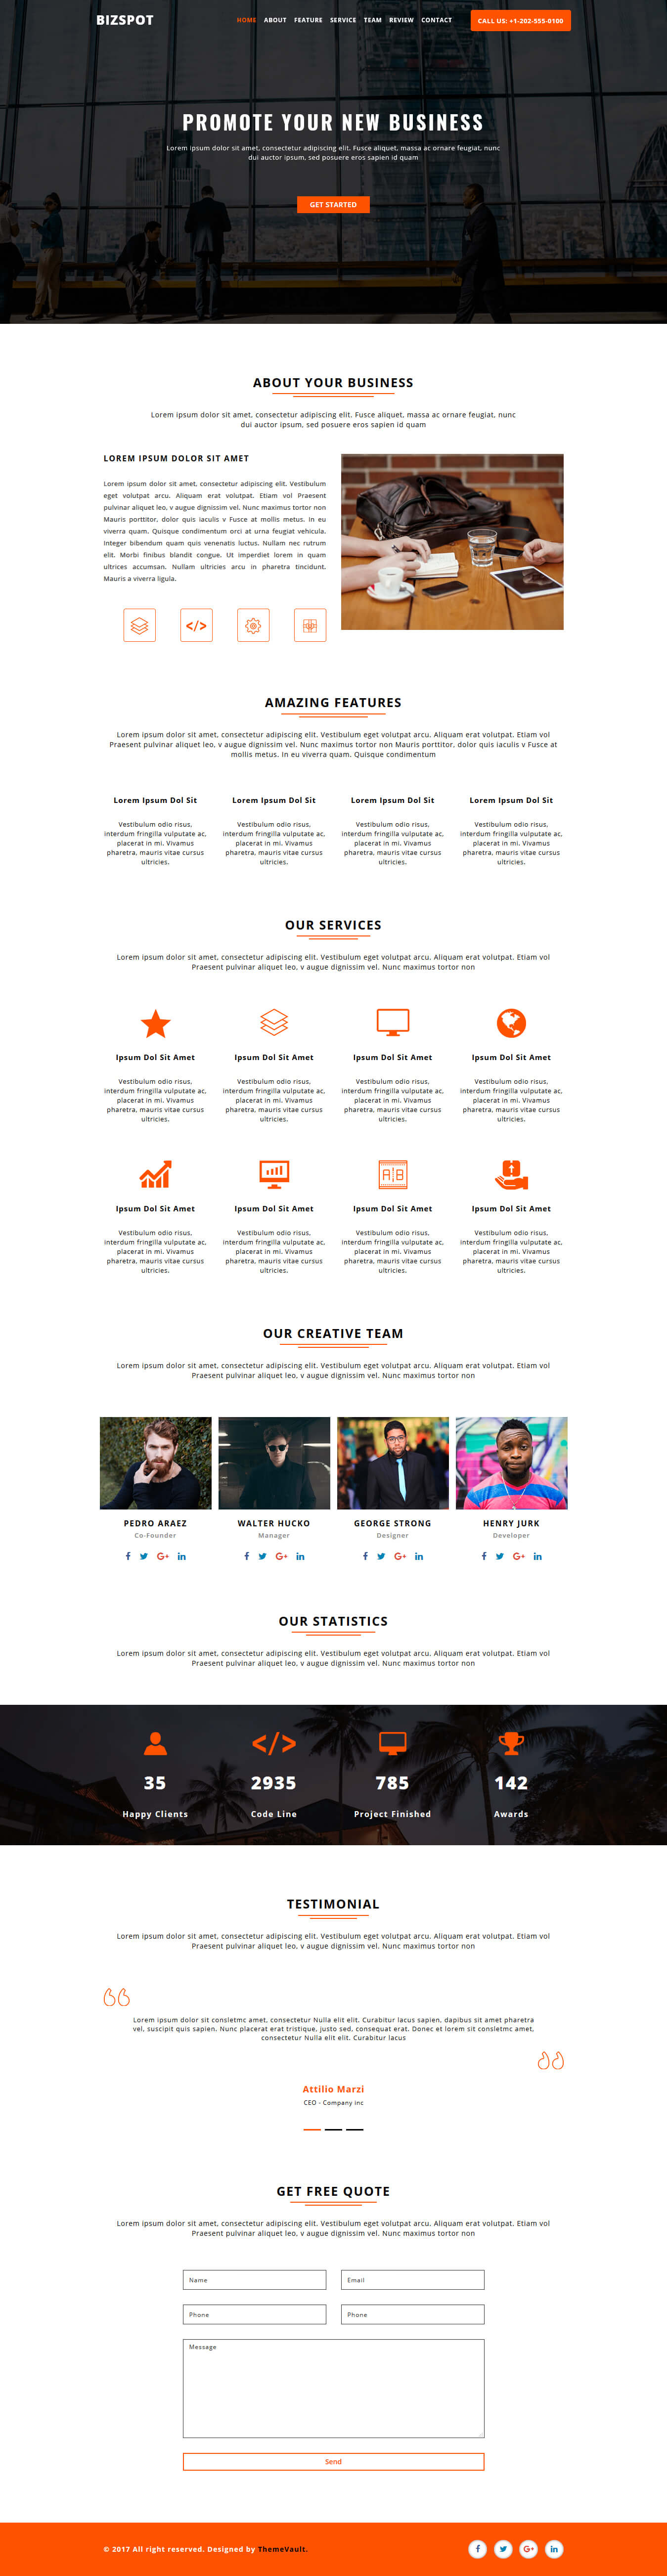 BizSpot- One Page Responsive HTML5 Website Template